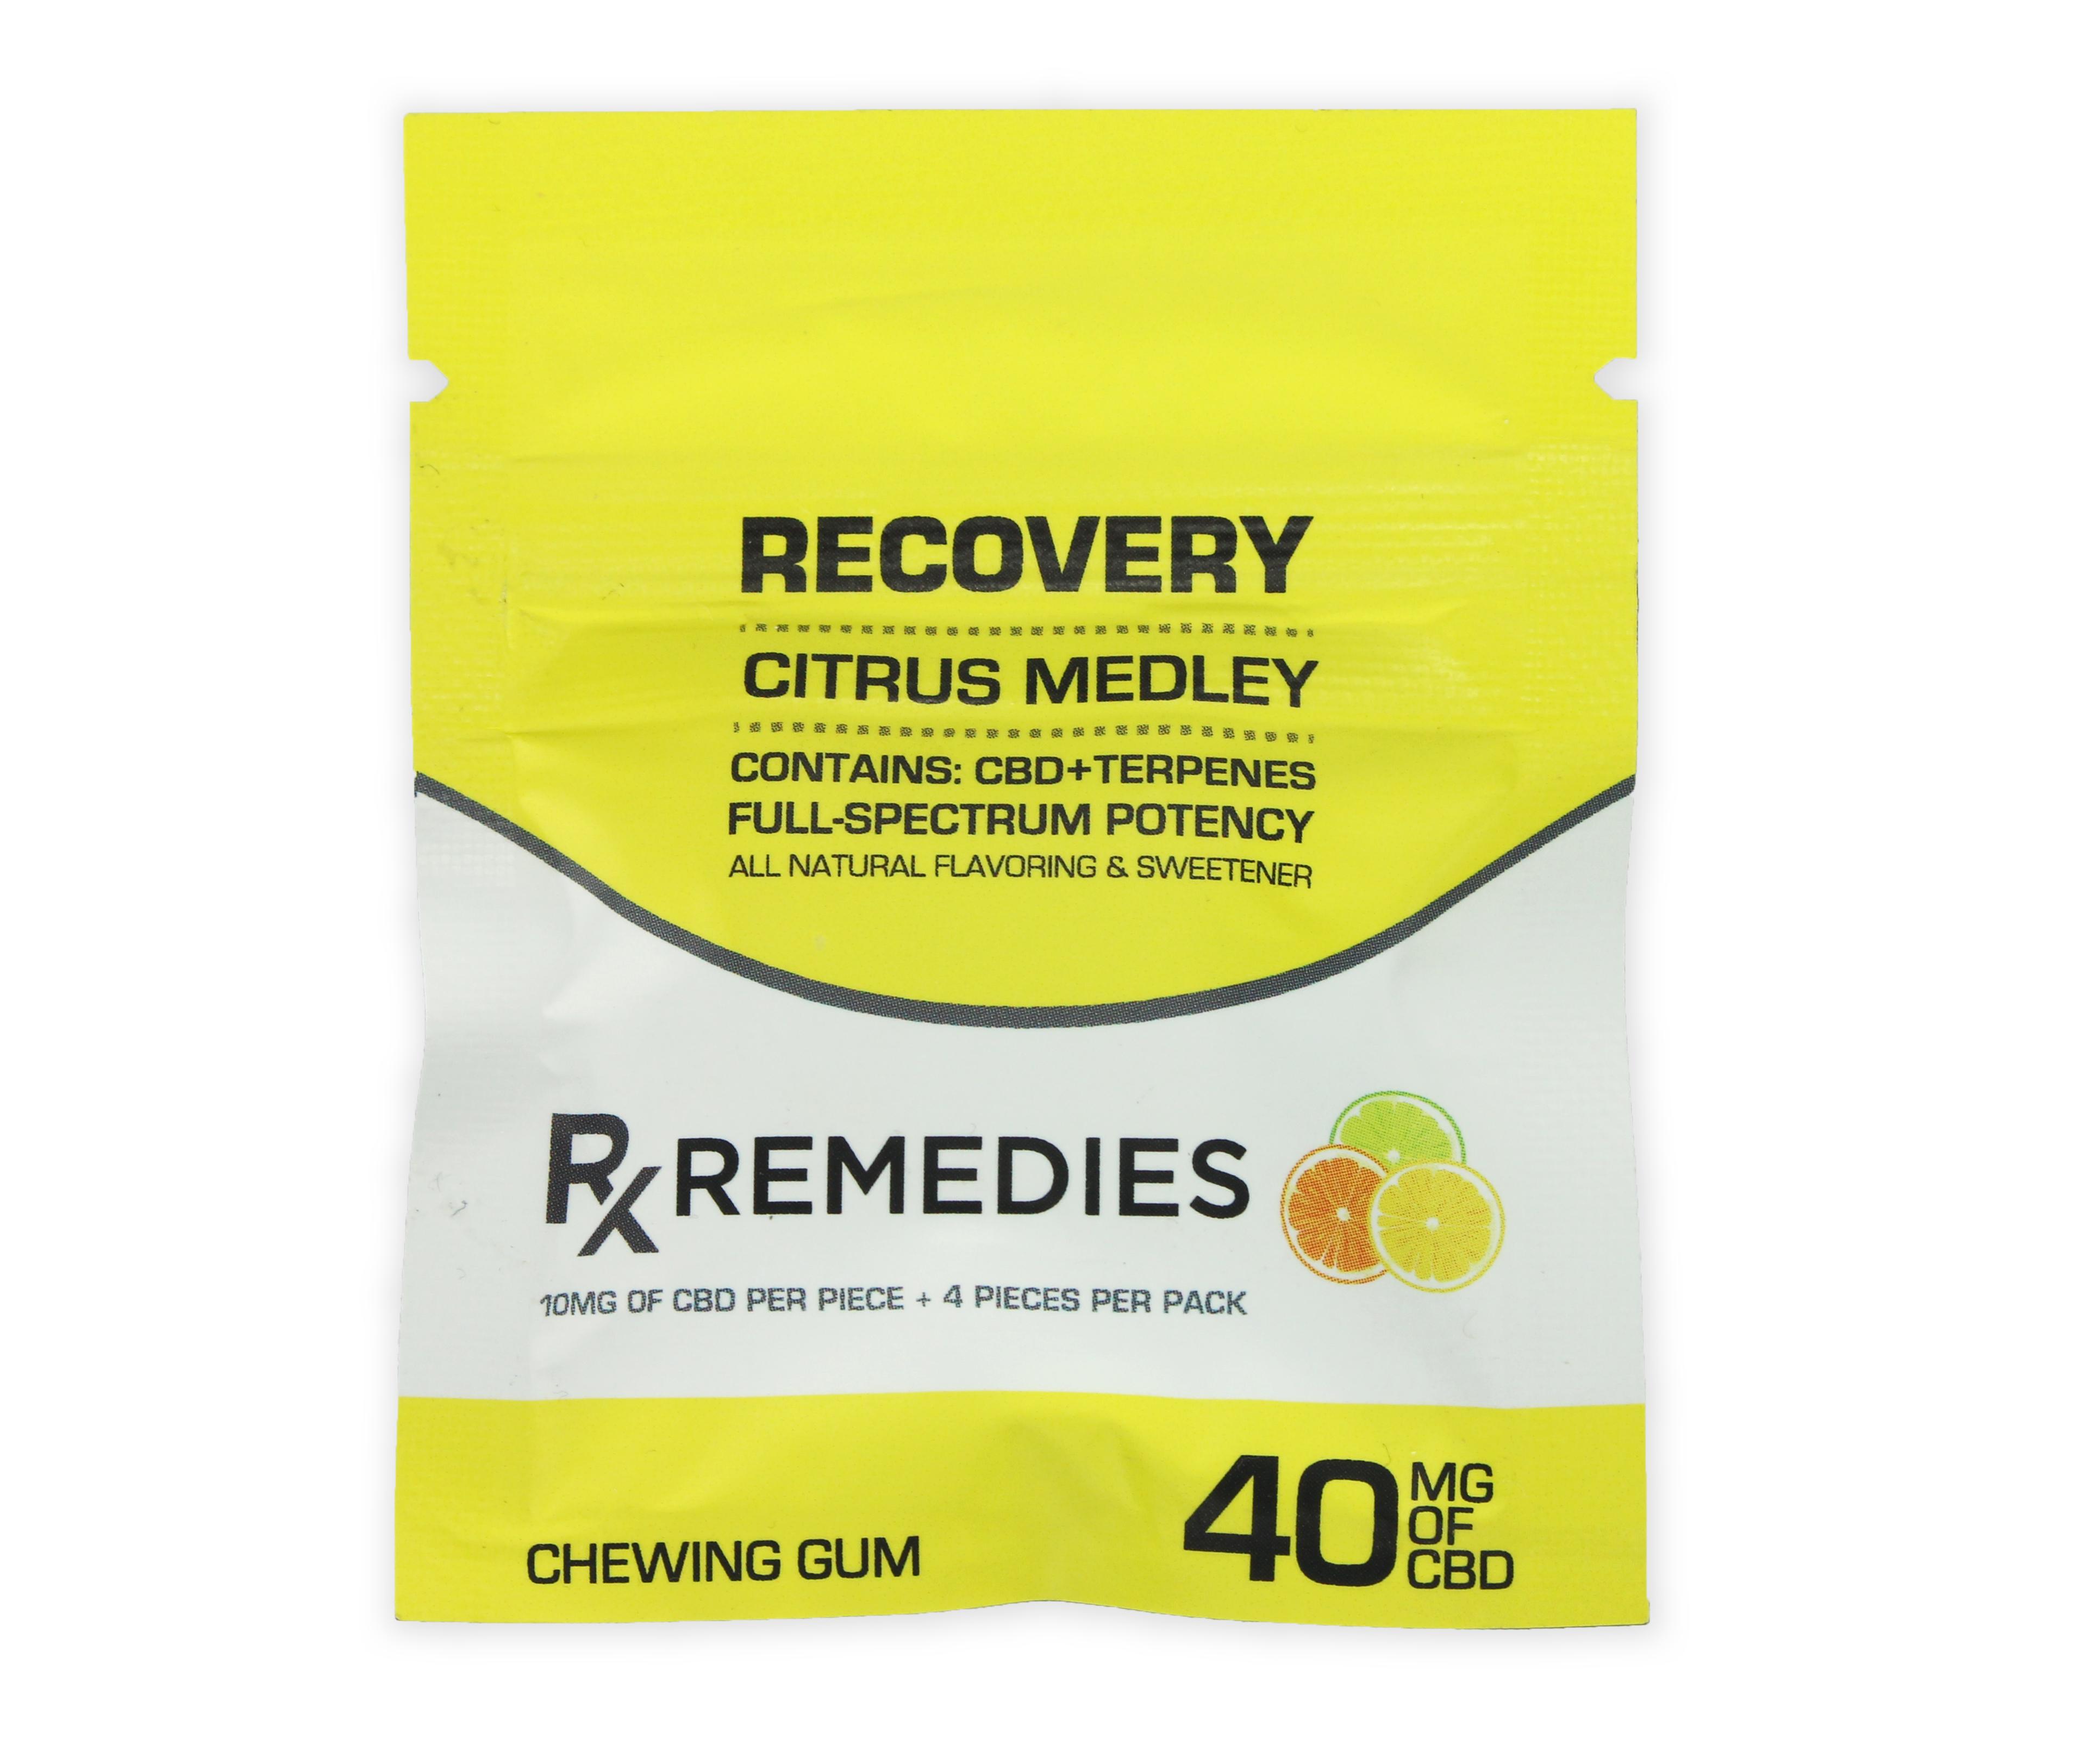 CBD Chewing Gum – Recovery Citrus Medley Full Spectrum